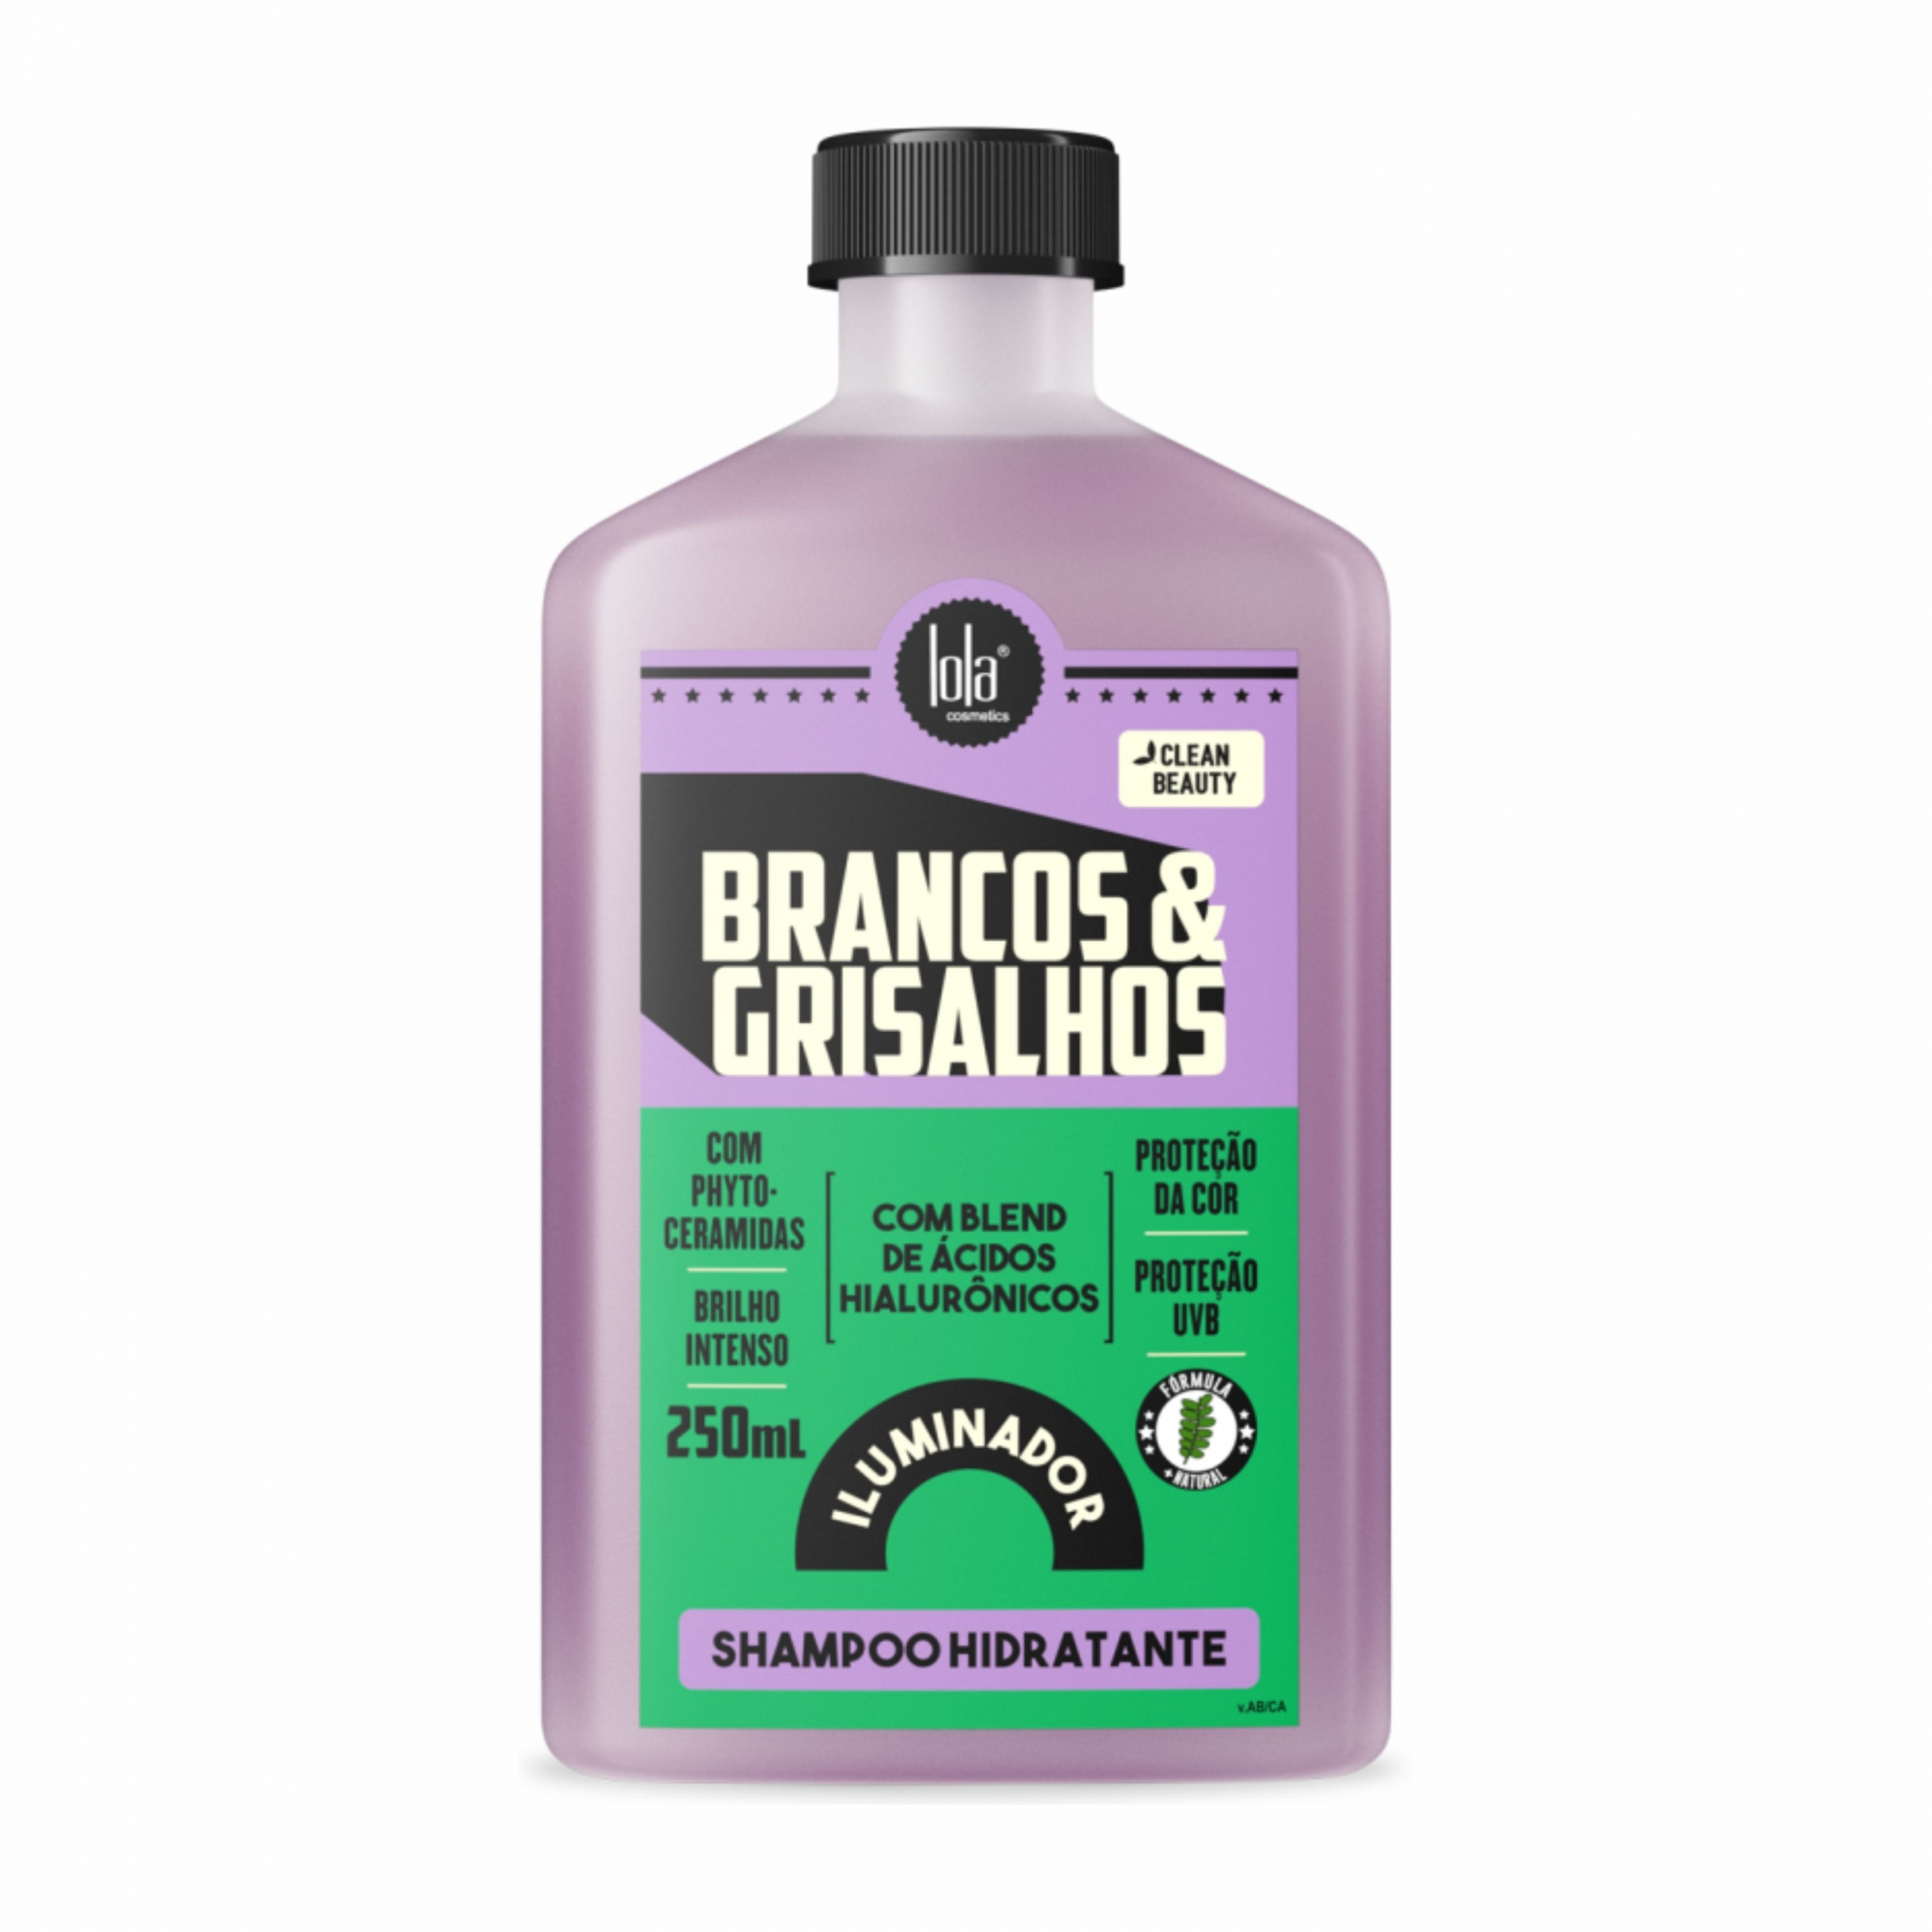 Shampoo Hidratante Brancos & Grisalhos Lola Cosmetics 250ml